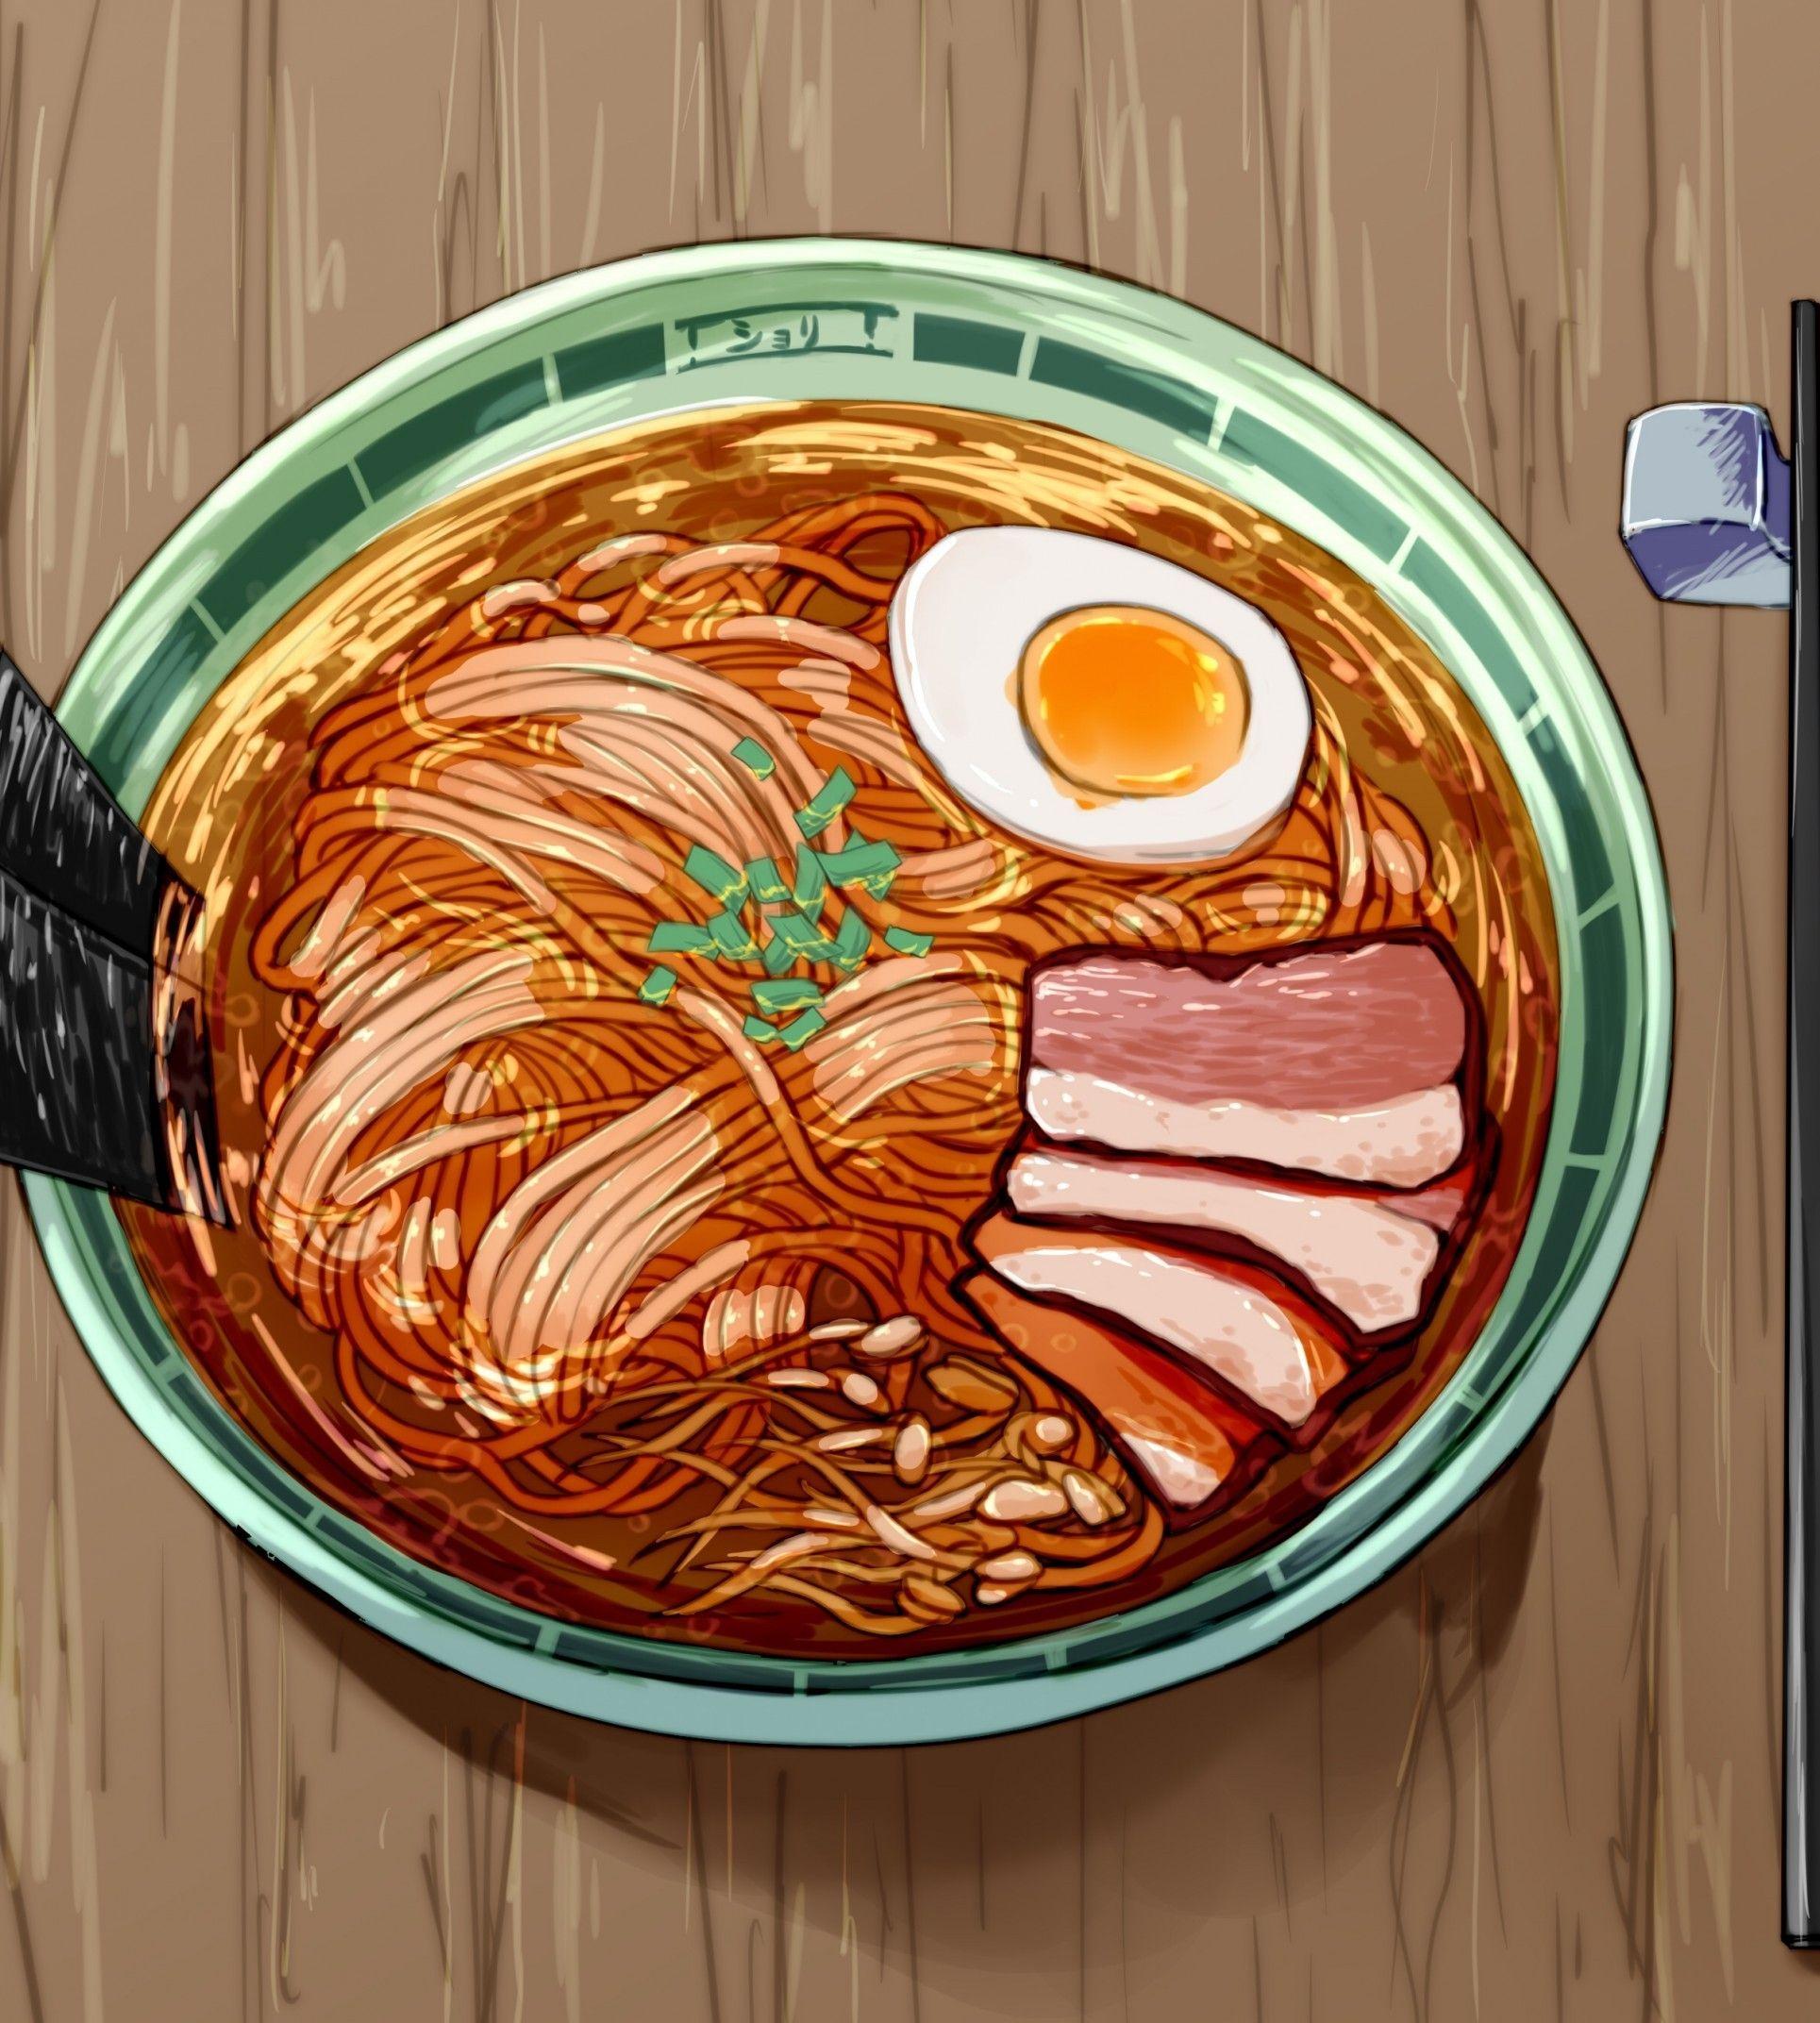 Download 1929x2144 Anime Ramen Delicious Chopsticks Egg Meat Wallpapers Wallpapermaiden Delicious Chopsticks Food